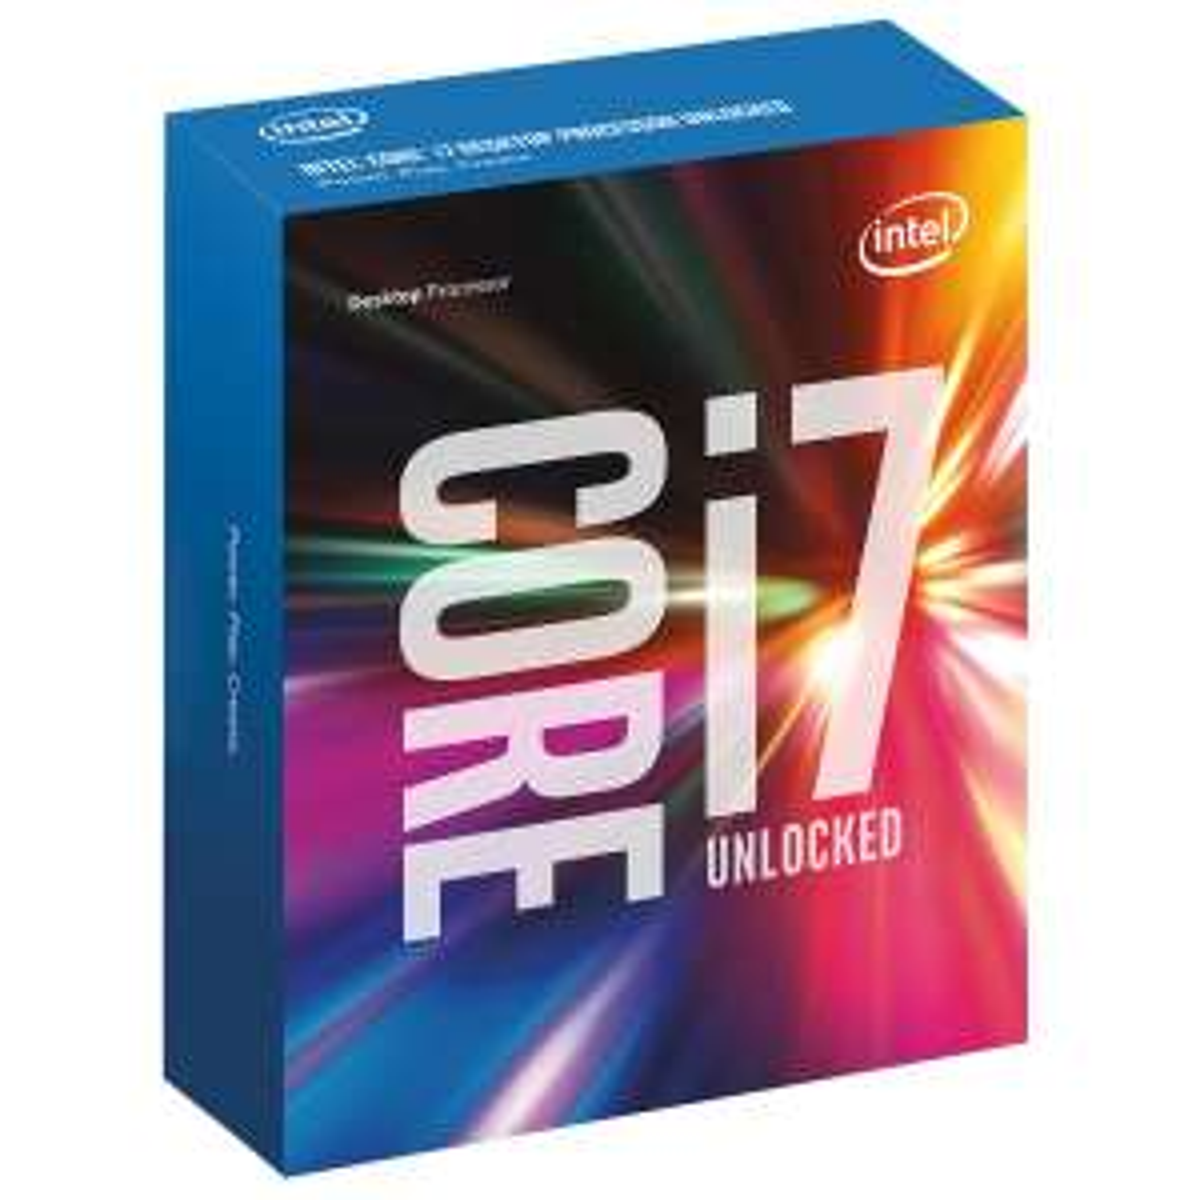 Processeur Intel Core i7-6700K, 4,0 GHz (4,2 GHz Turbo Boost)